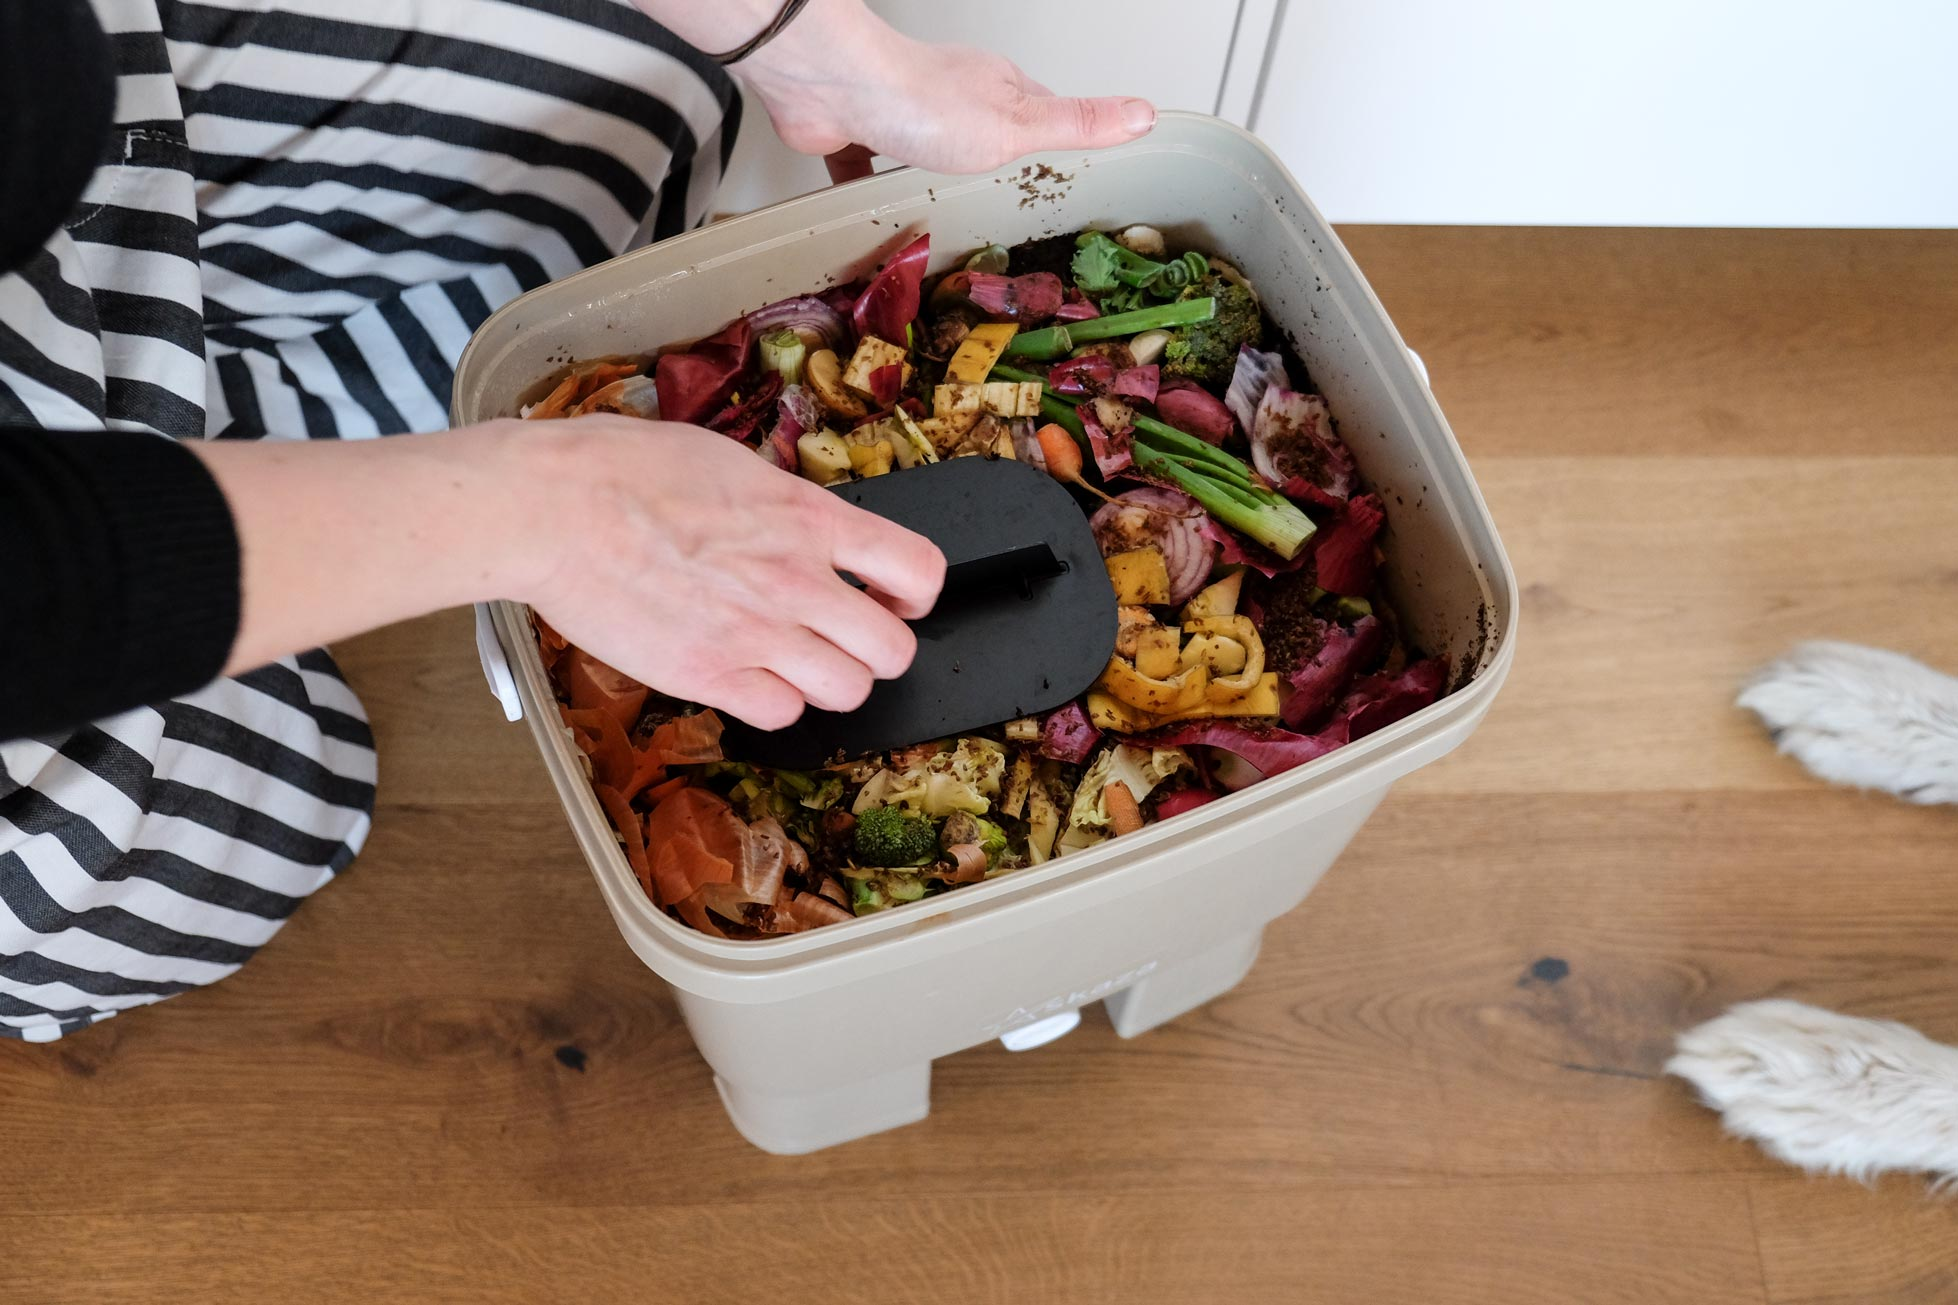 PlaceToBe - report on Bokashi Organko composters 4